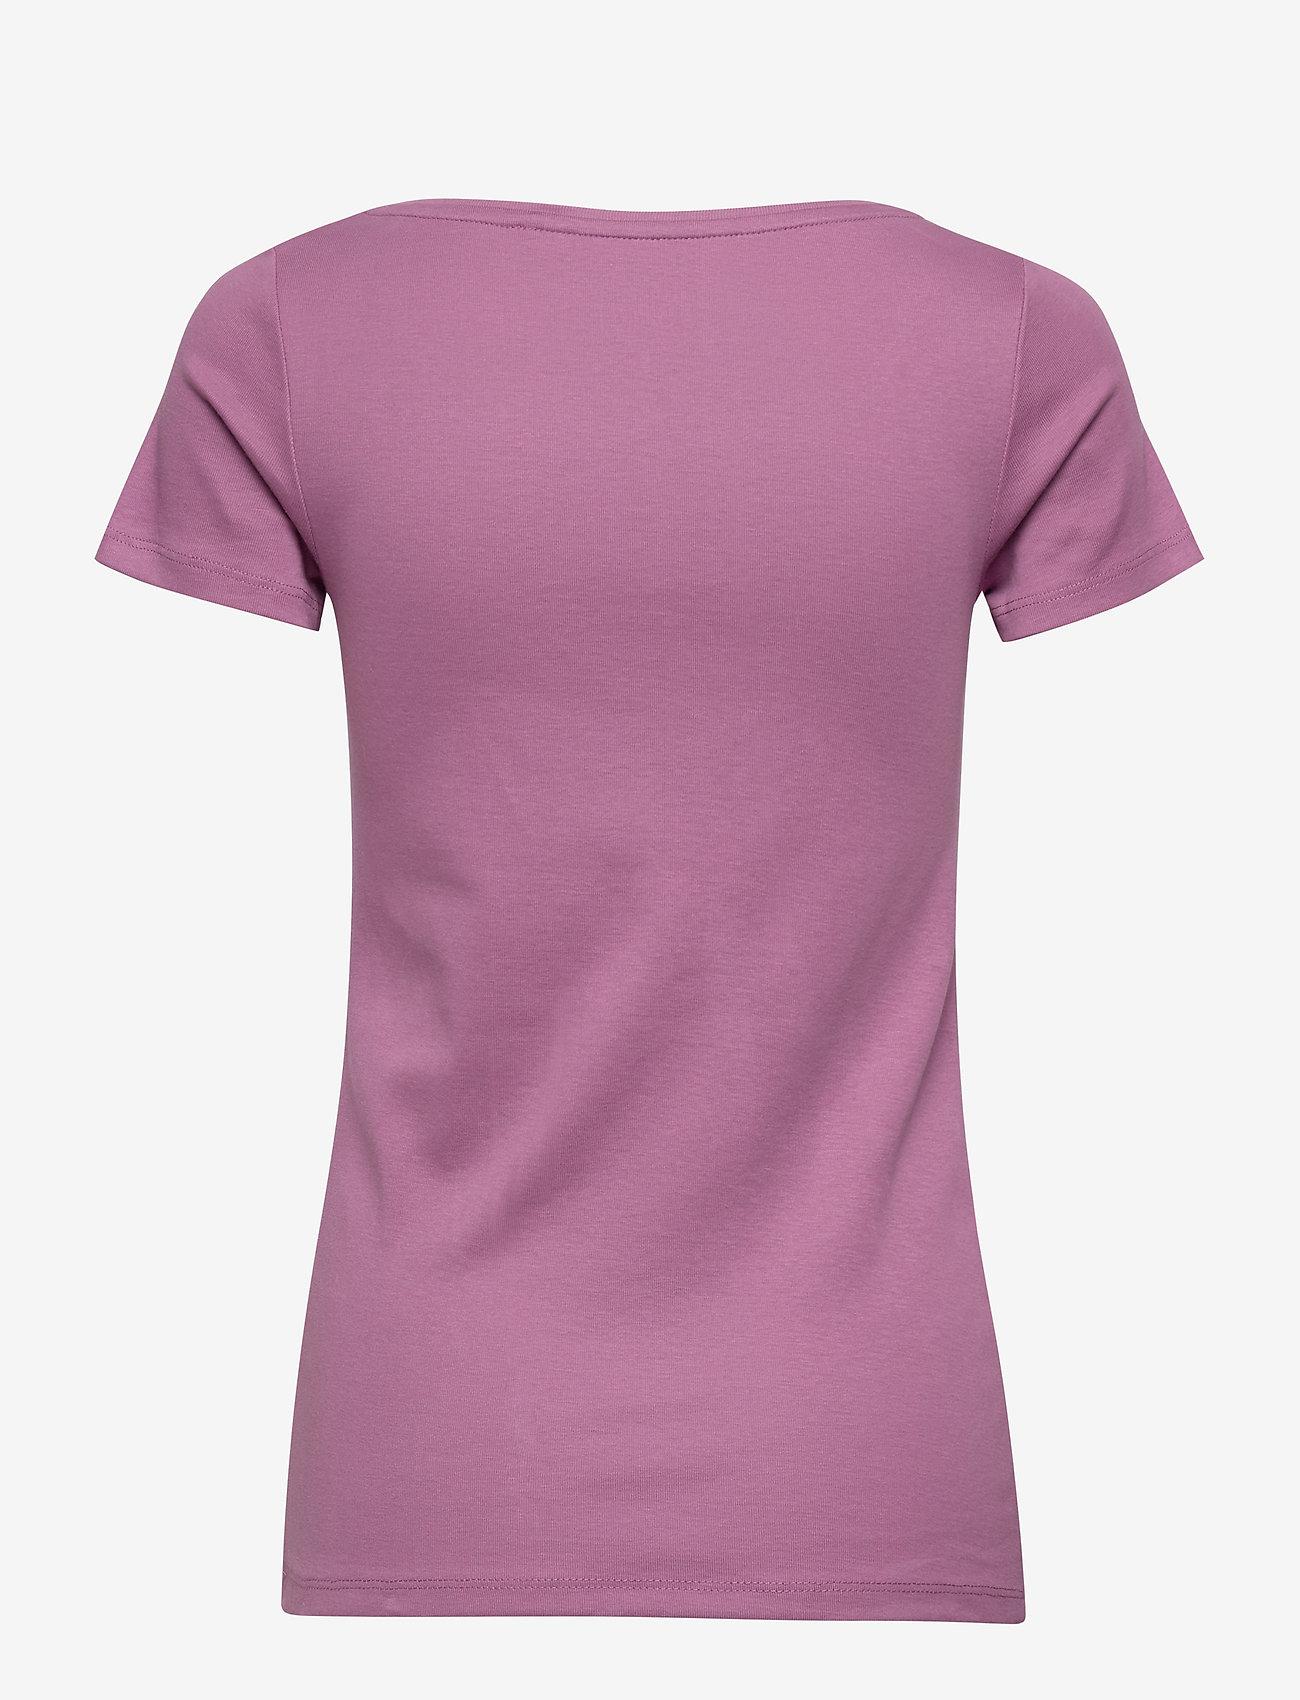 Esprit Casual - T-Shirts - t-shirts - dark mauve 4 - 1